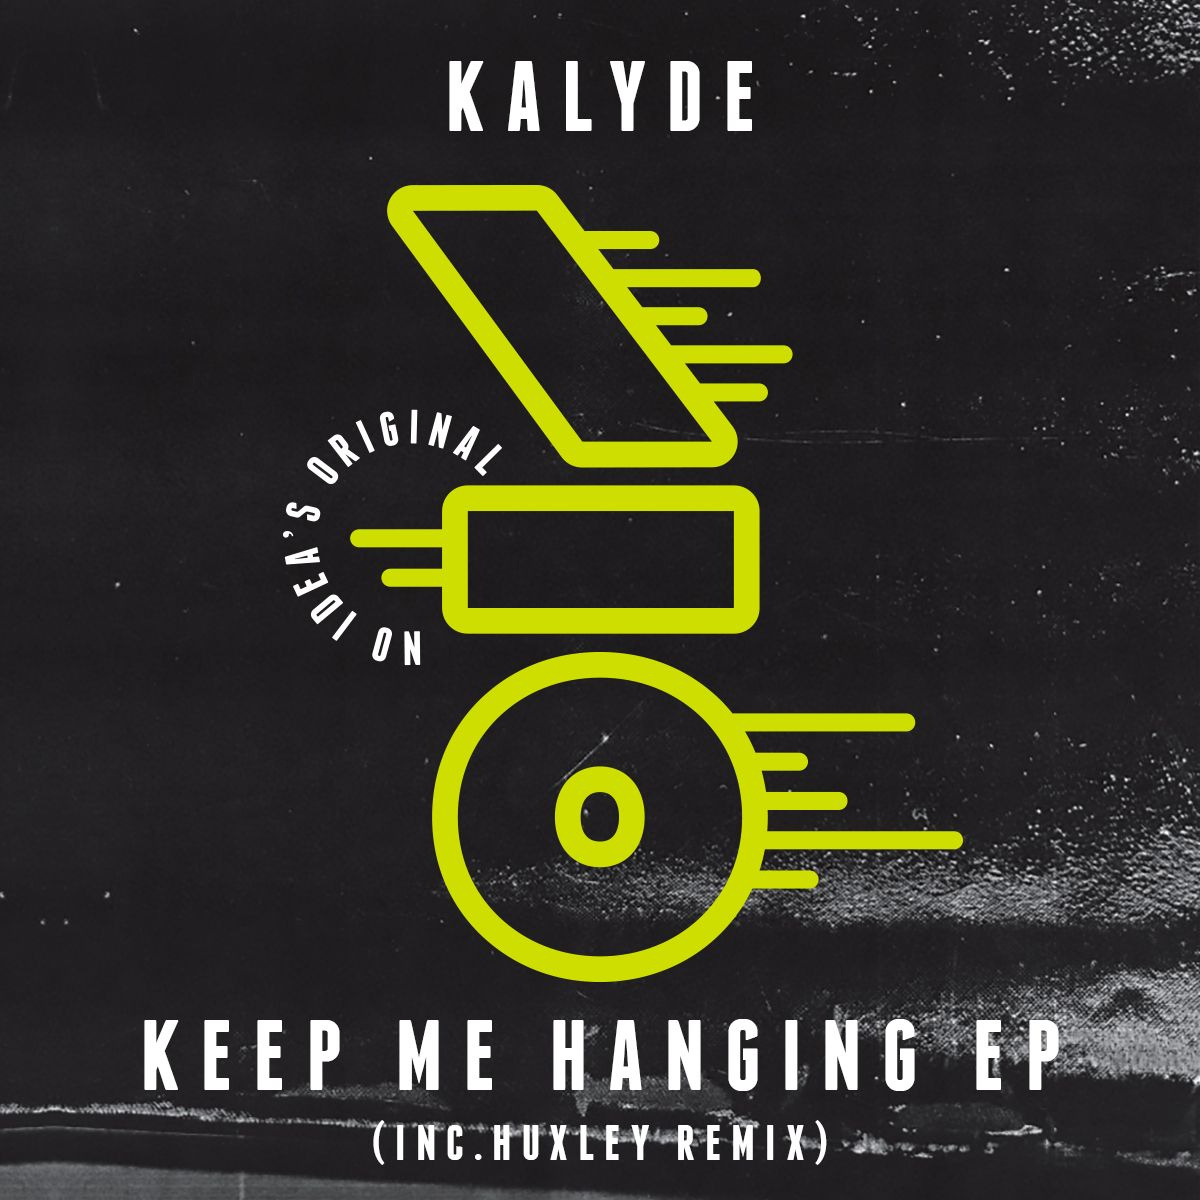 pack_shot_kalyde_-_keep_me_hanging_ep_-_no_ideas_original.jpg